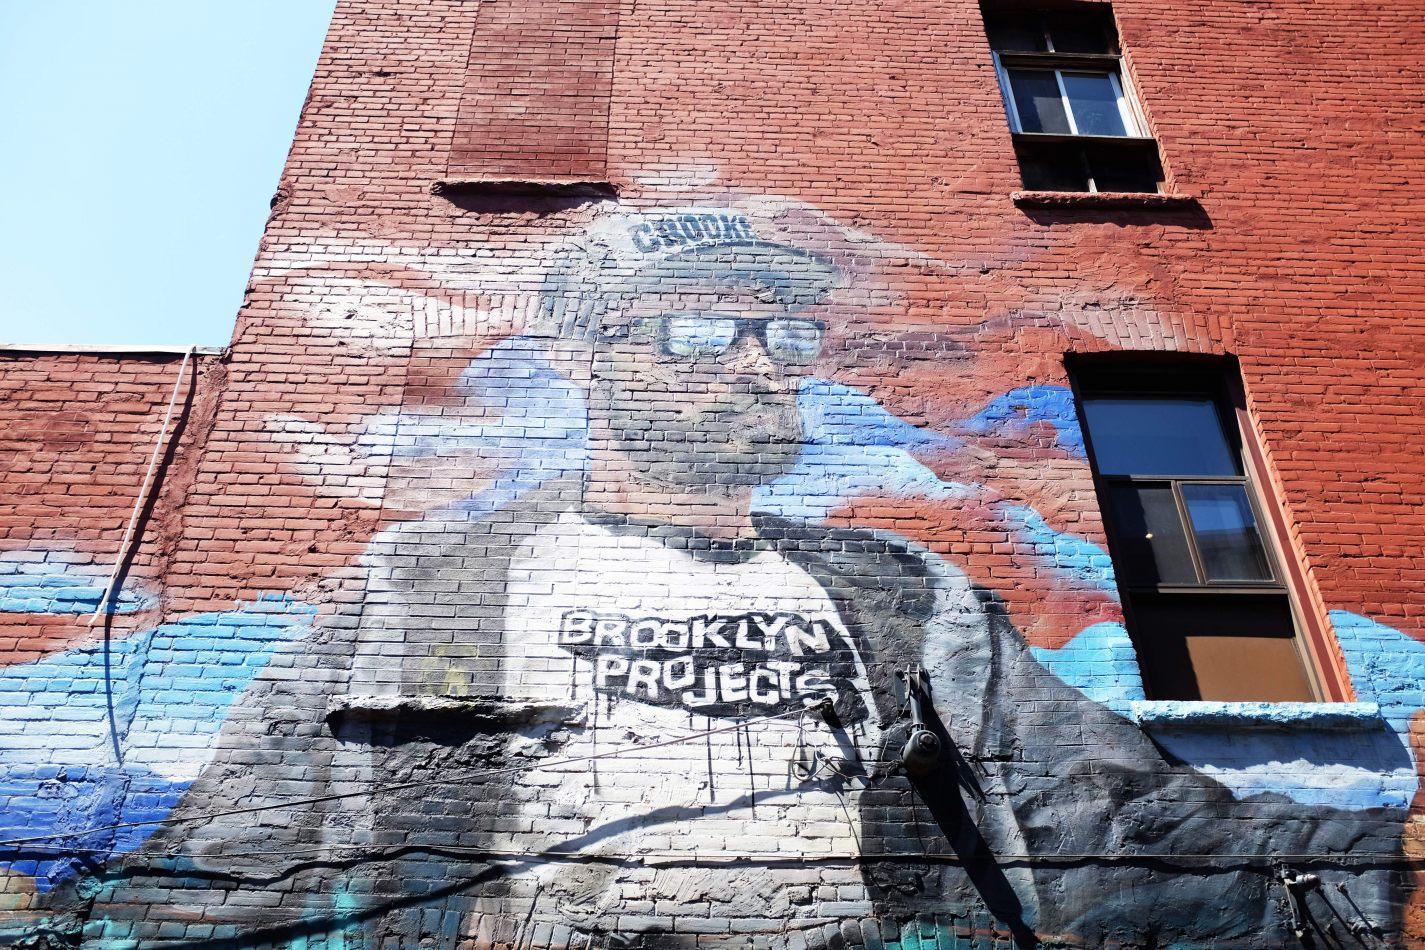 Hibiscus & Nomada : Canada - Brooklyn Projects